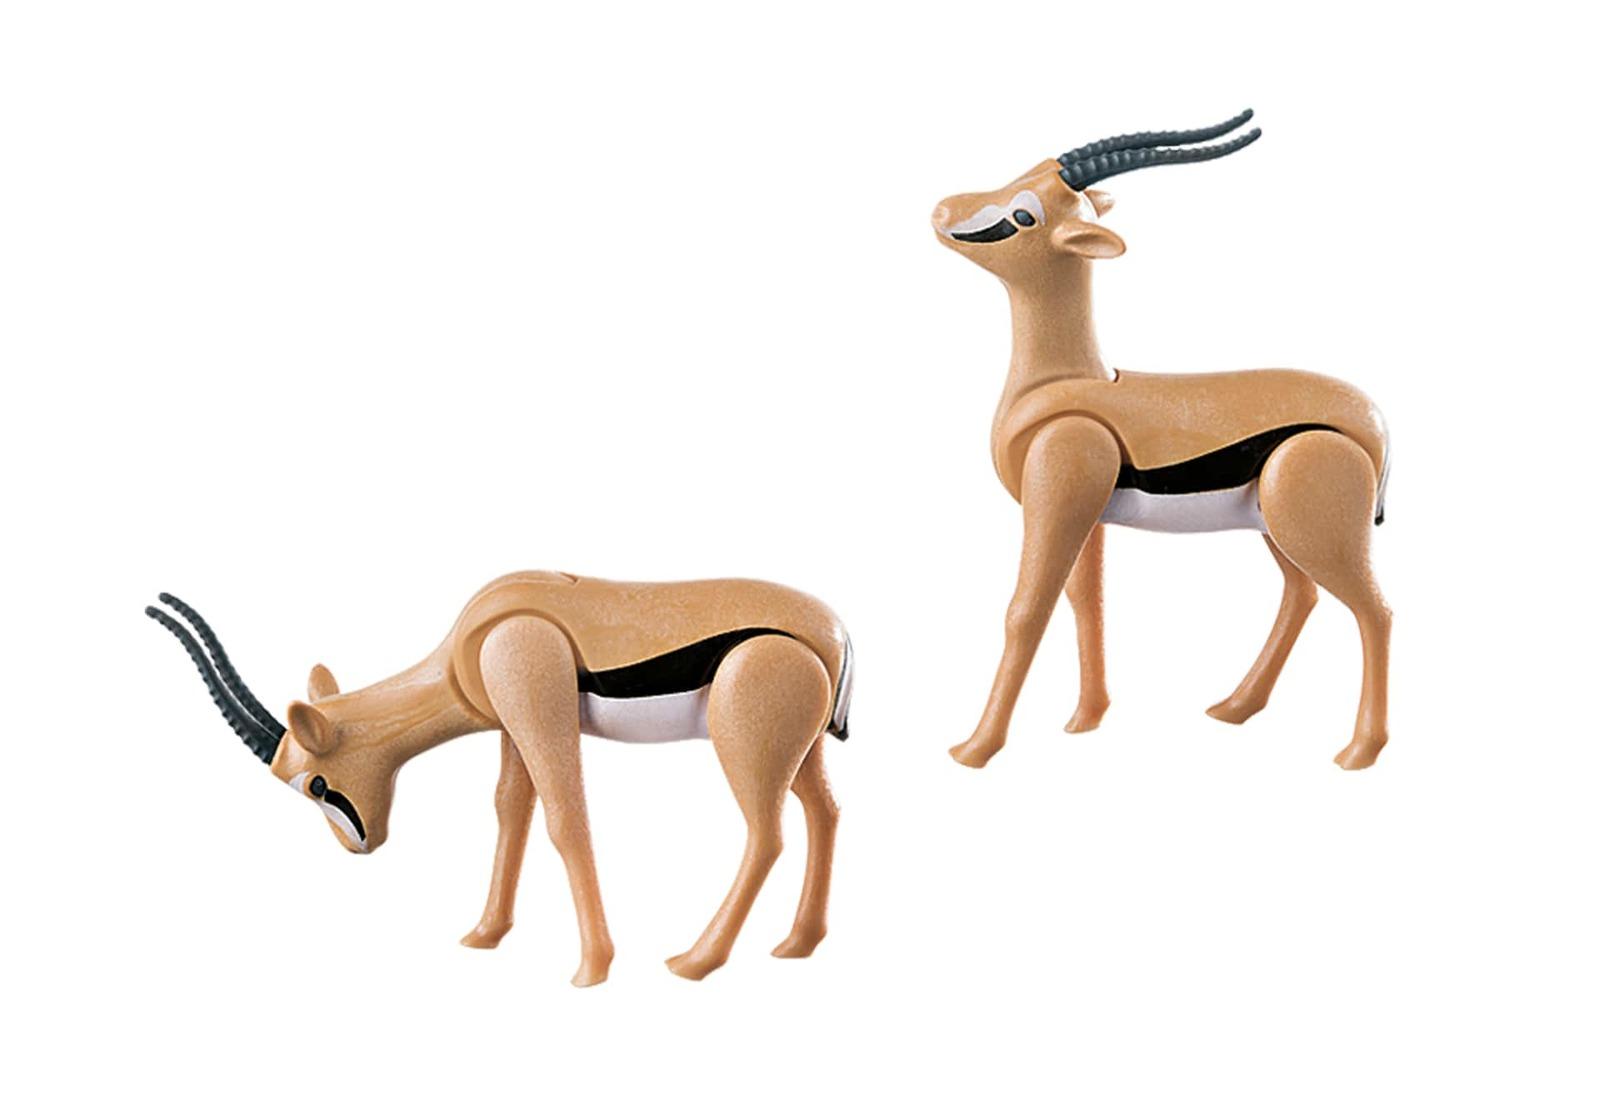 Playmobil: Wildlife - Gazelles image